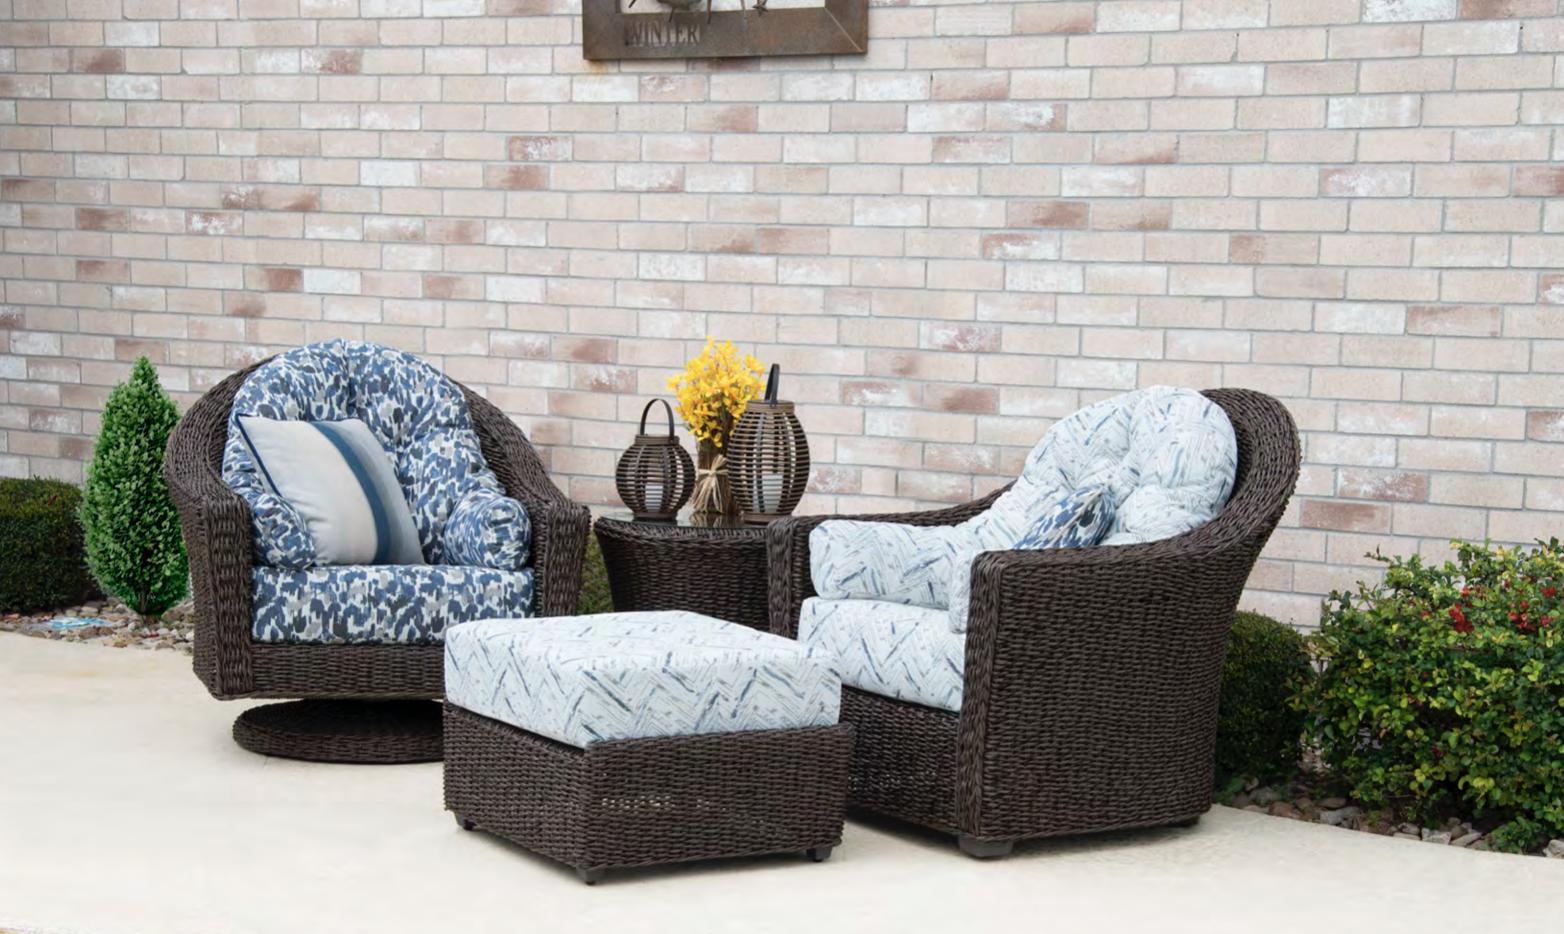 woodard-isabella-outdoor-furniture.png